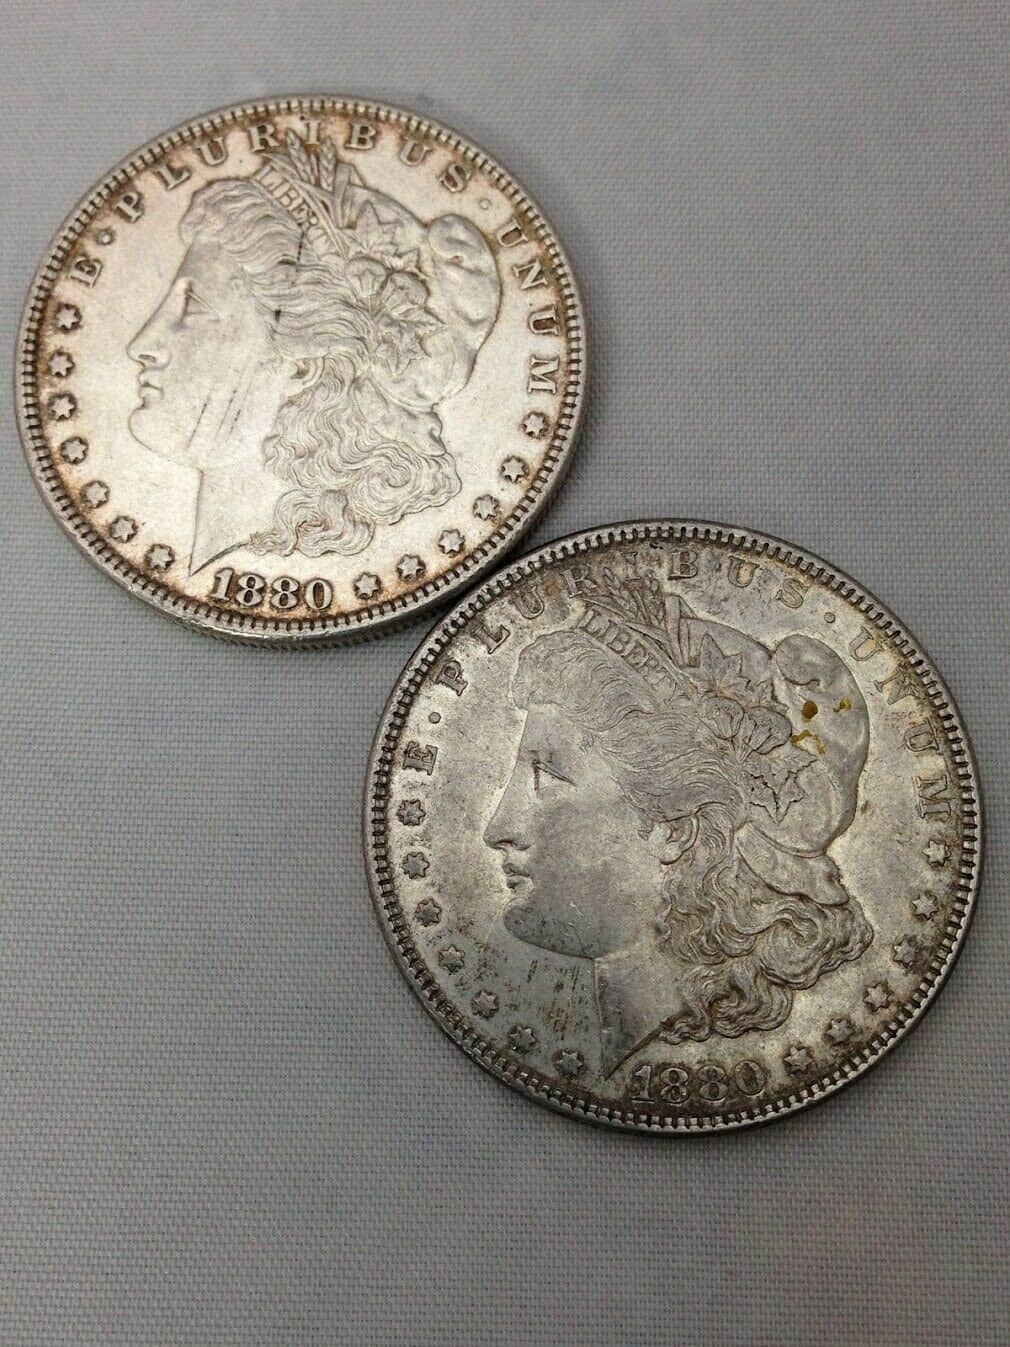 Morgan Silver Dollar History